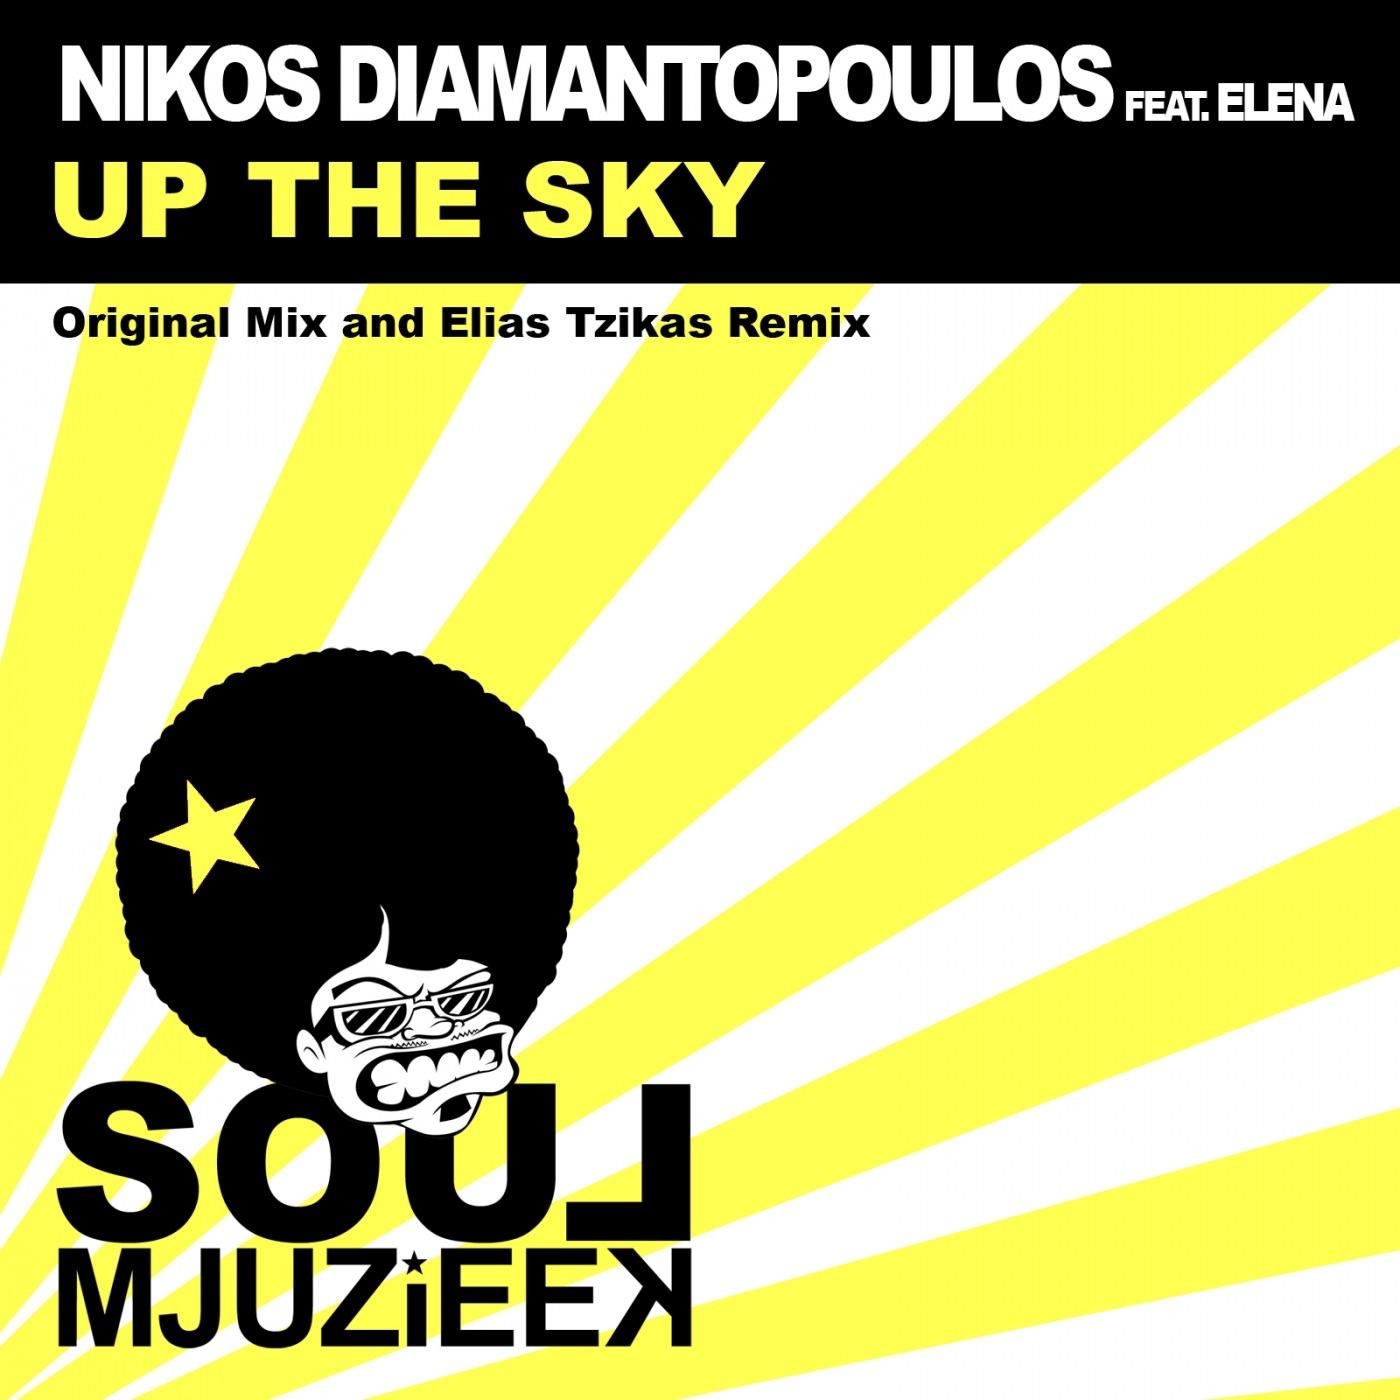 Up the Sky (feat. Elena) - Single